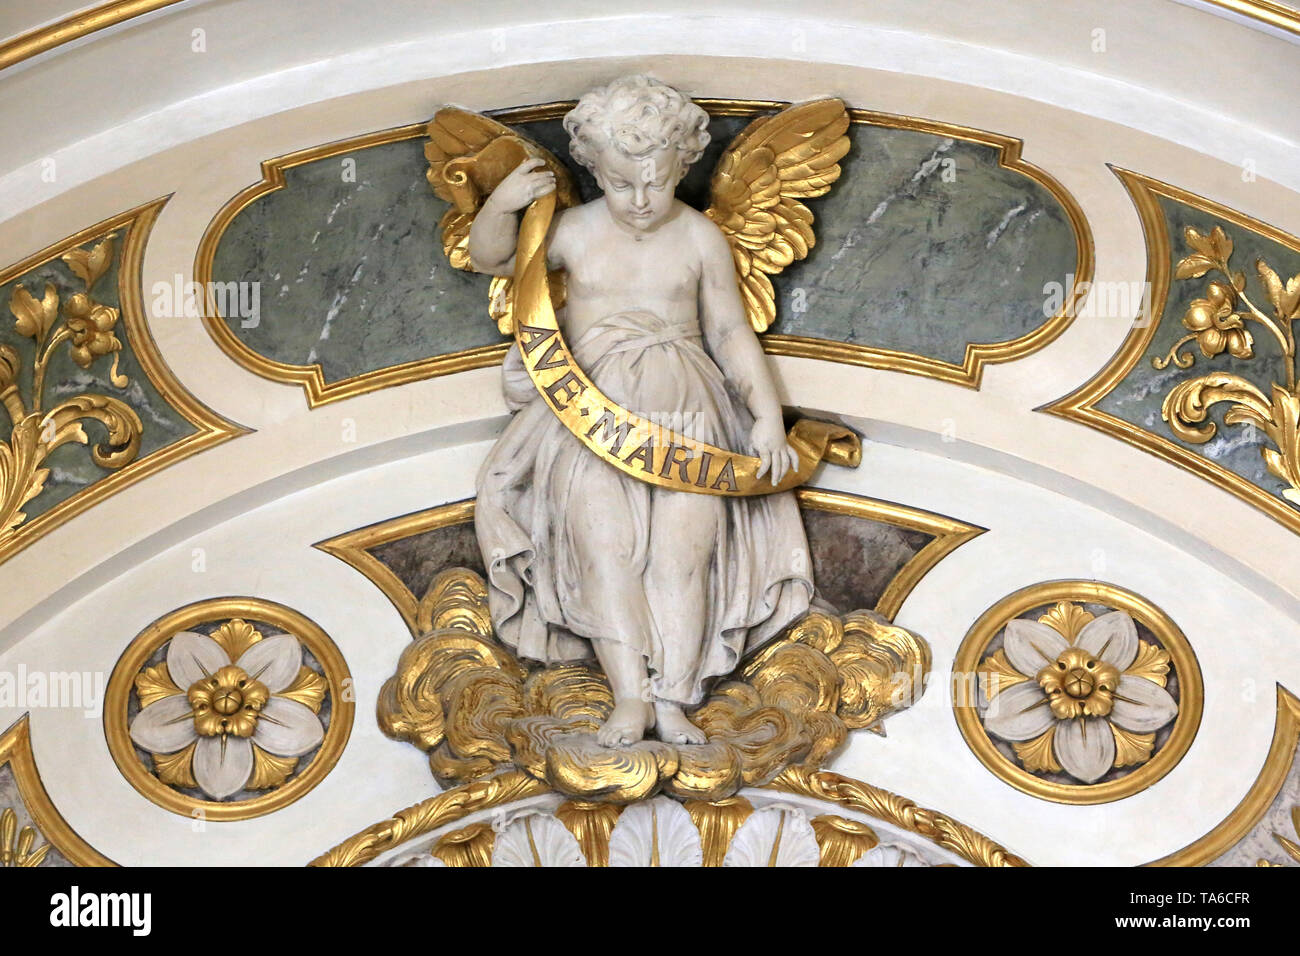 Ave Maria. Ange. Eglise Saint-Bruno-les-Chartreux. Lyon. Ave Maria. Engel. St. Bruno Les Chartreux's Kirche. Lyon. Stockbild